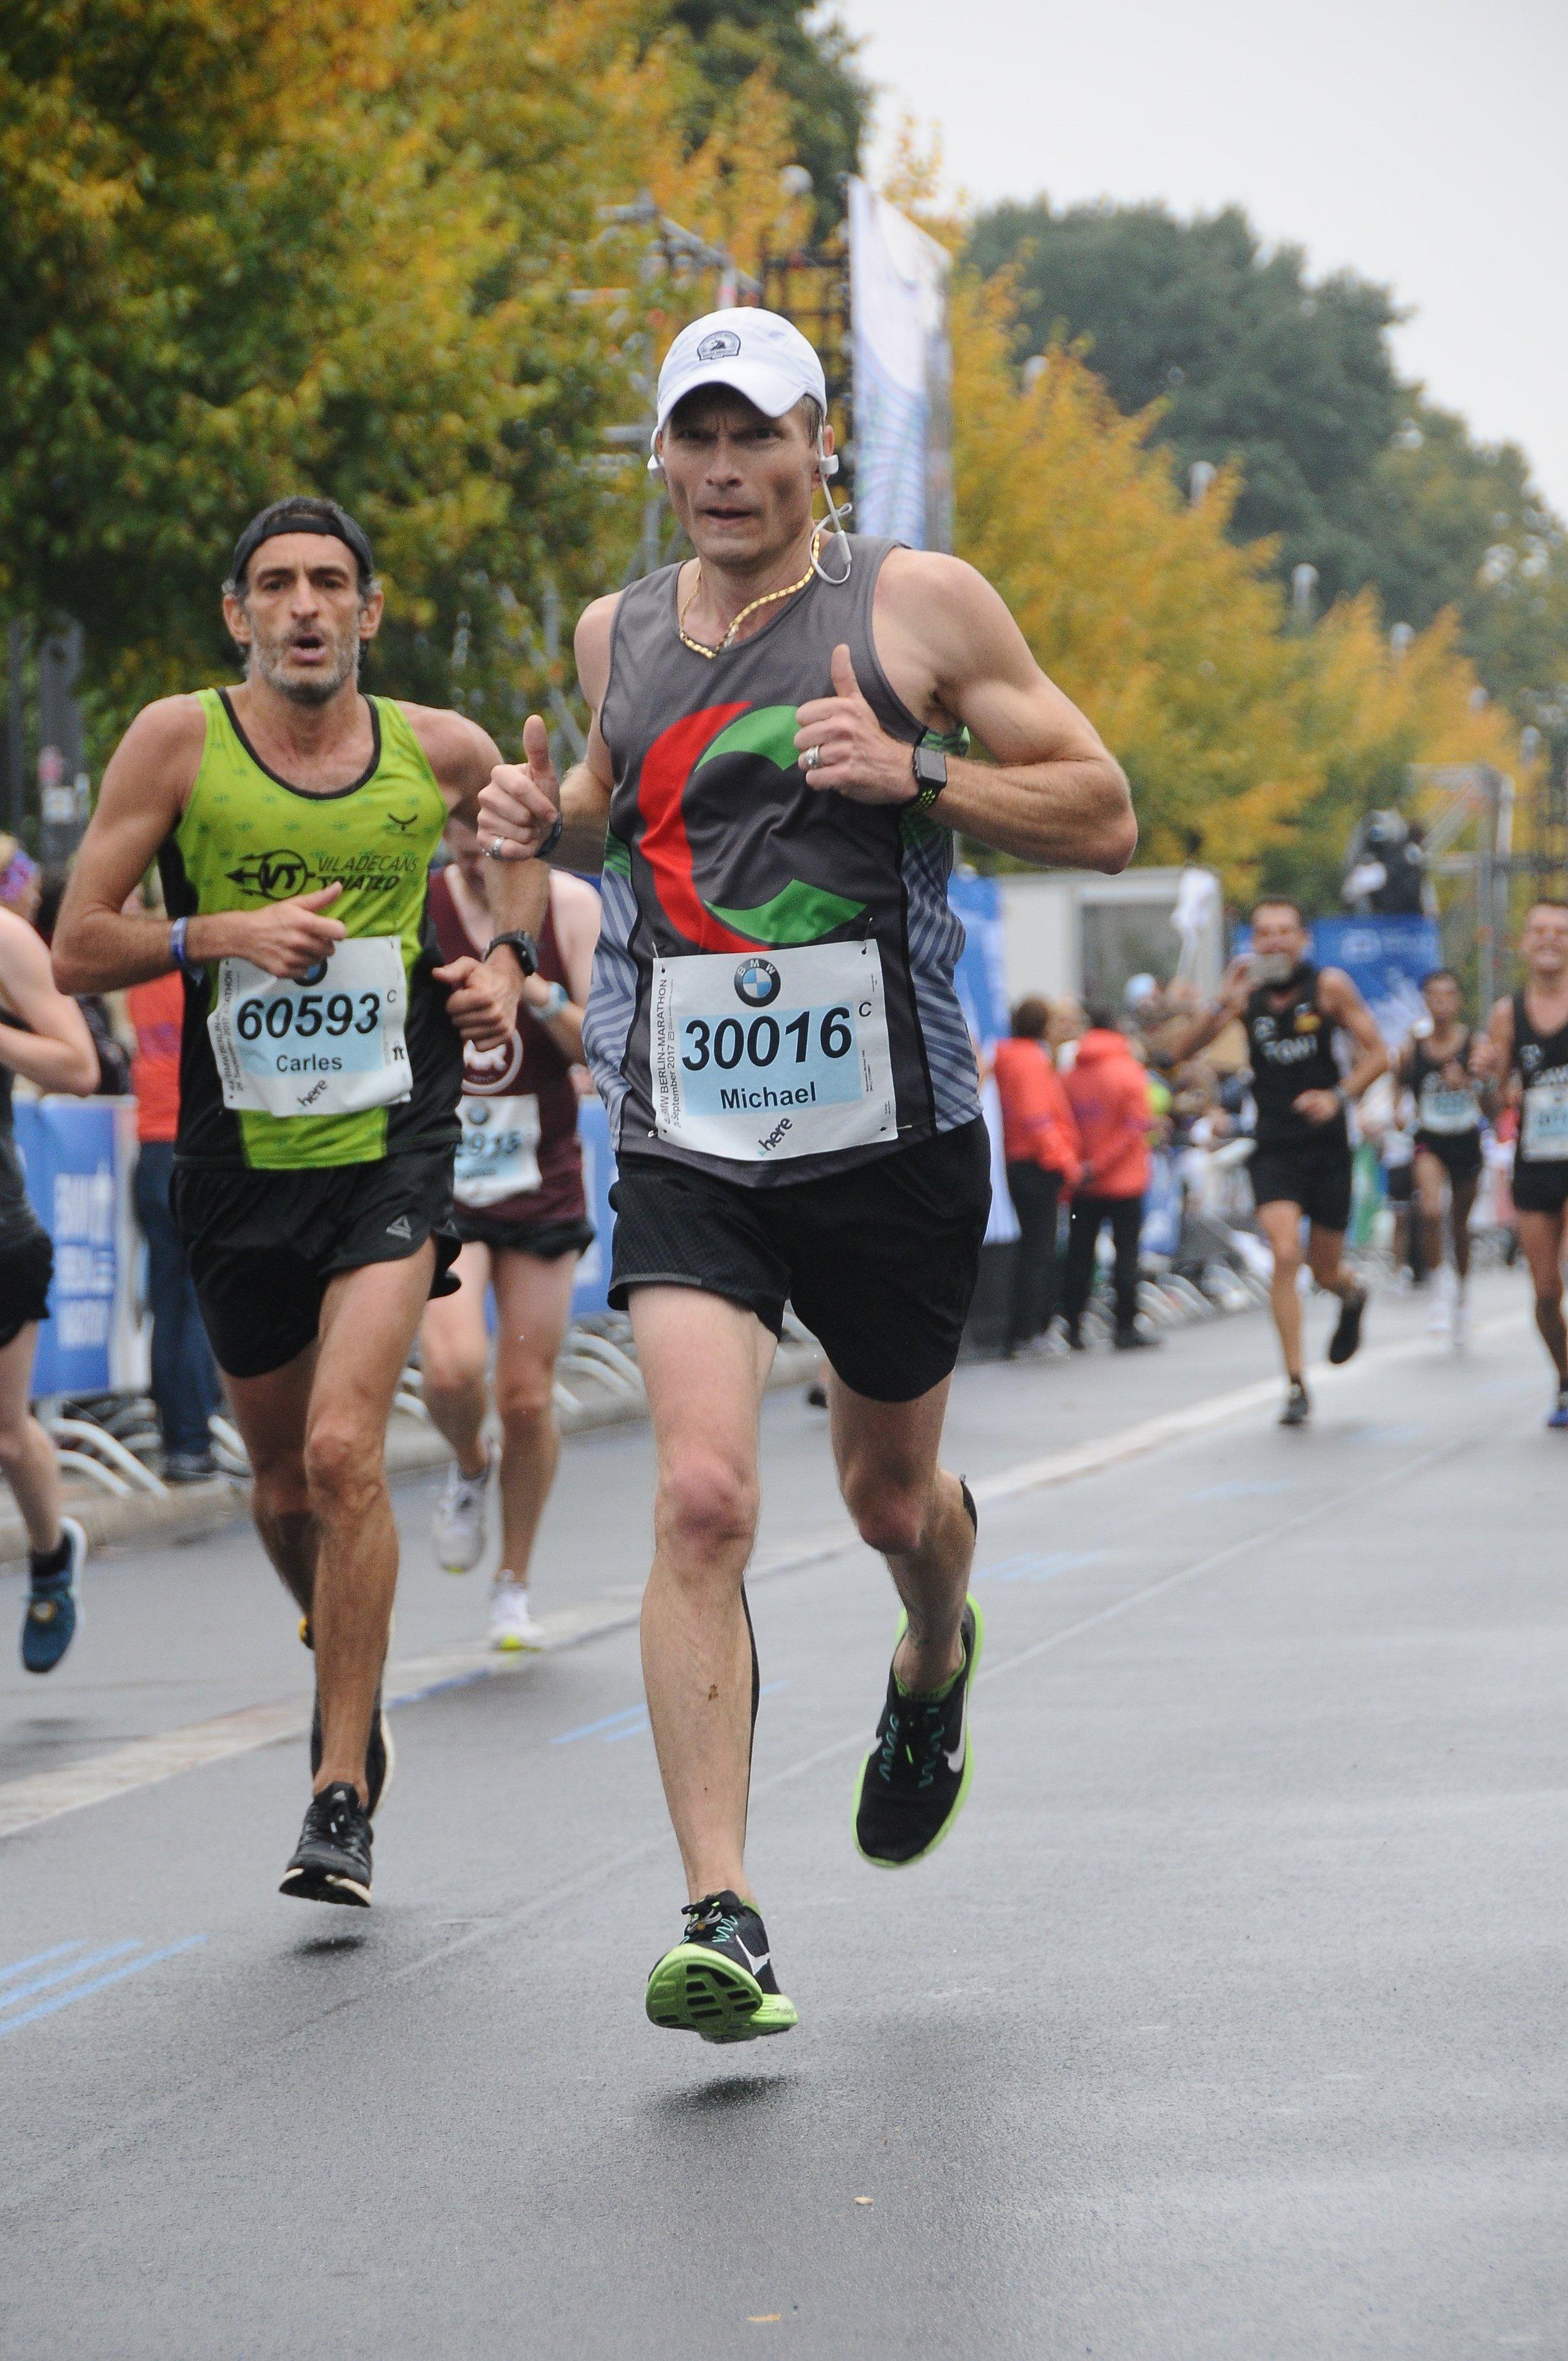 michael m running 2.jpg